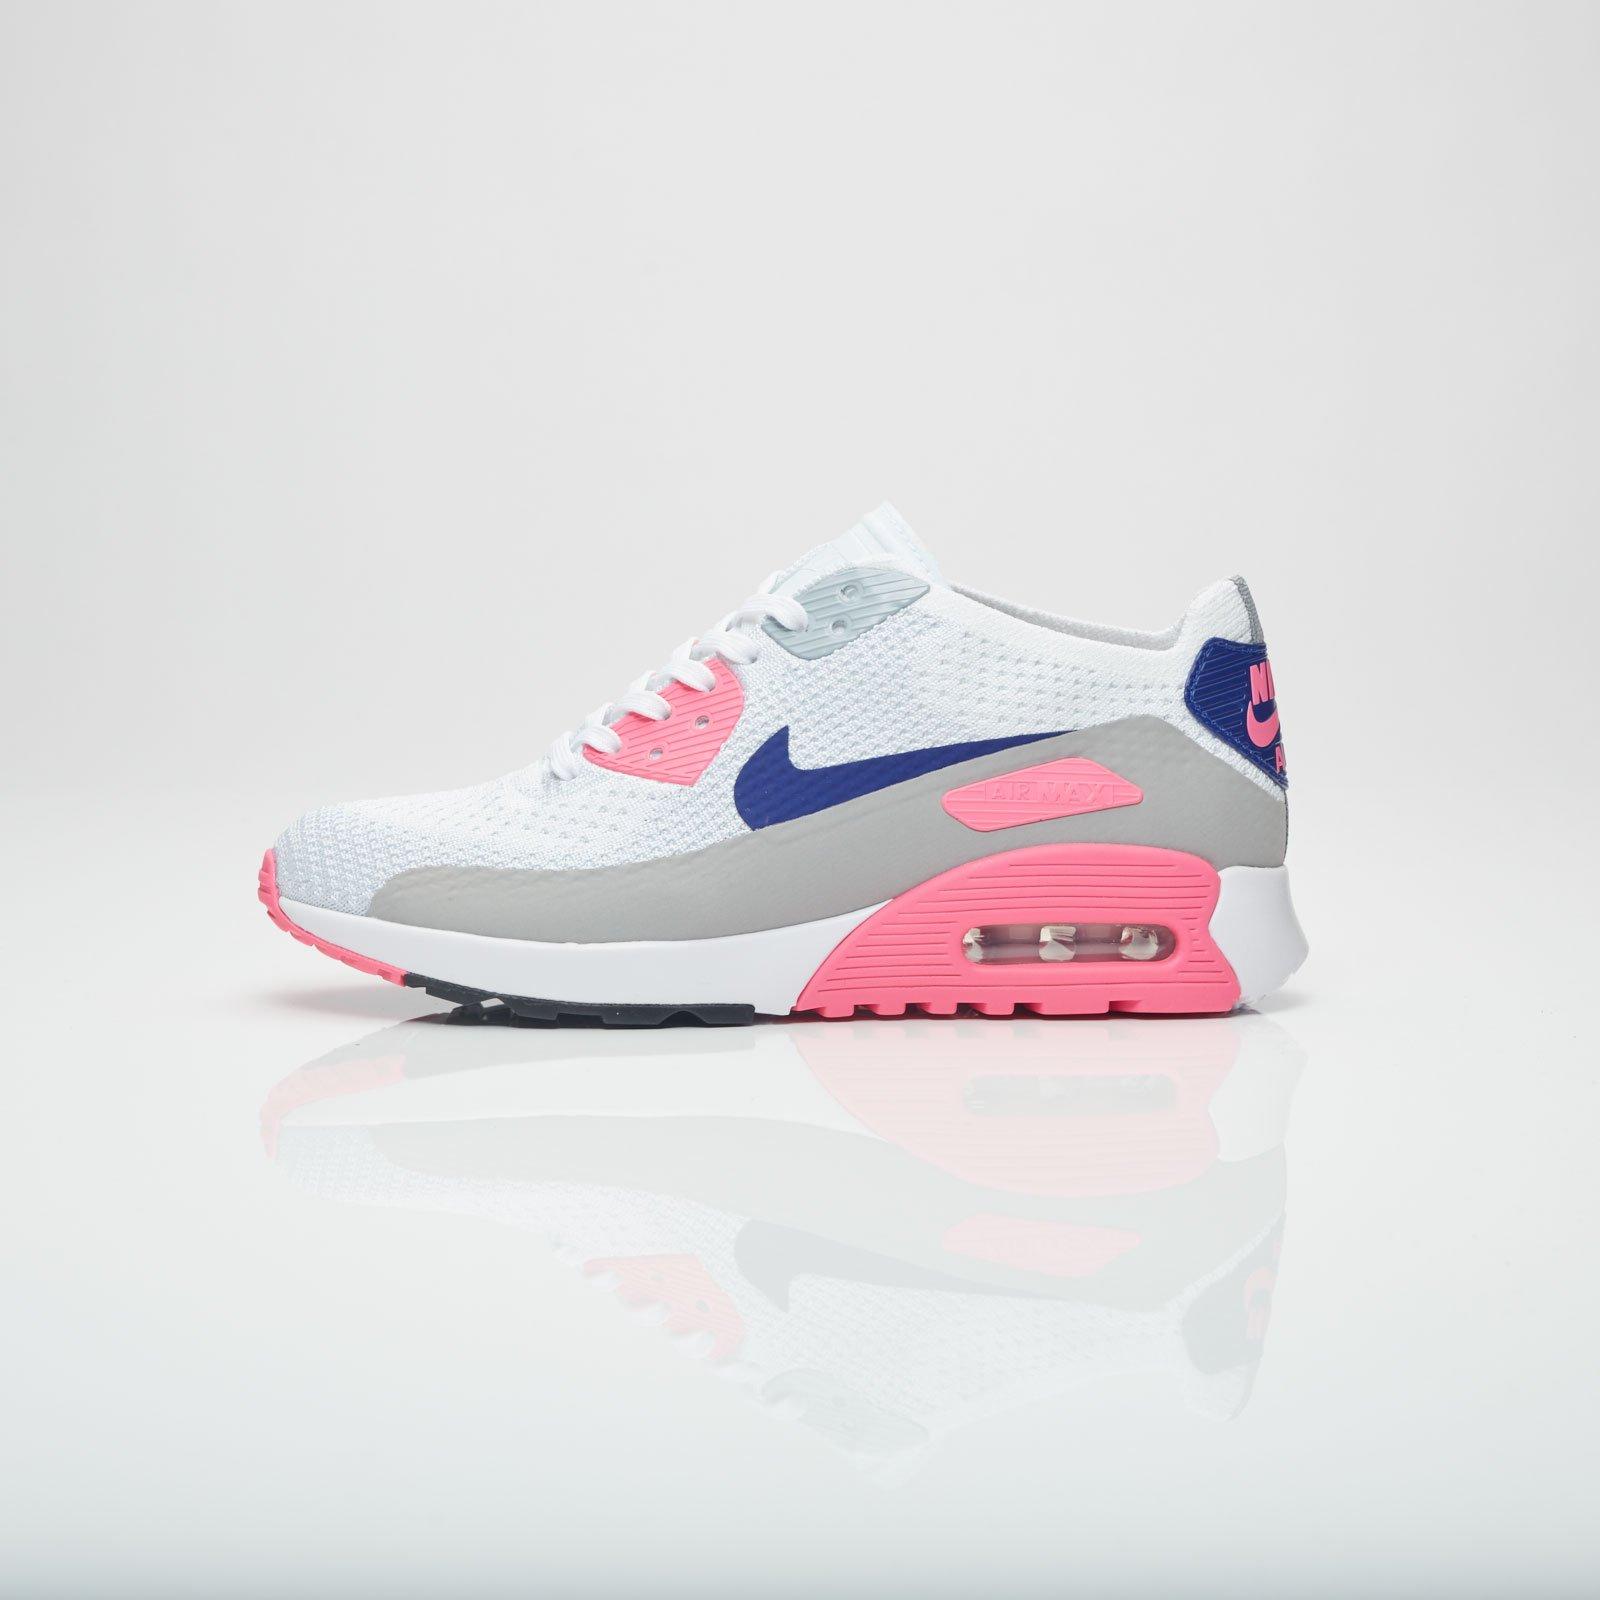 new product c025d c851c Nike Wmns Air Max 90 Ultra 2.0 Flyknit - 881109-101 - Sneakersnstuff    sneakers   streetwear på nätet sen 1999